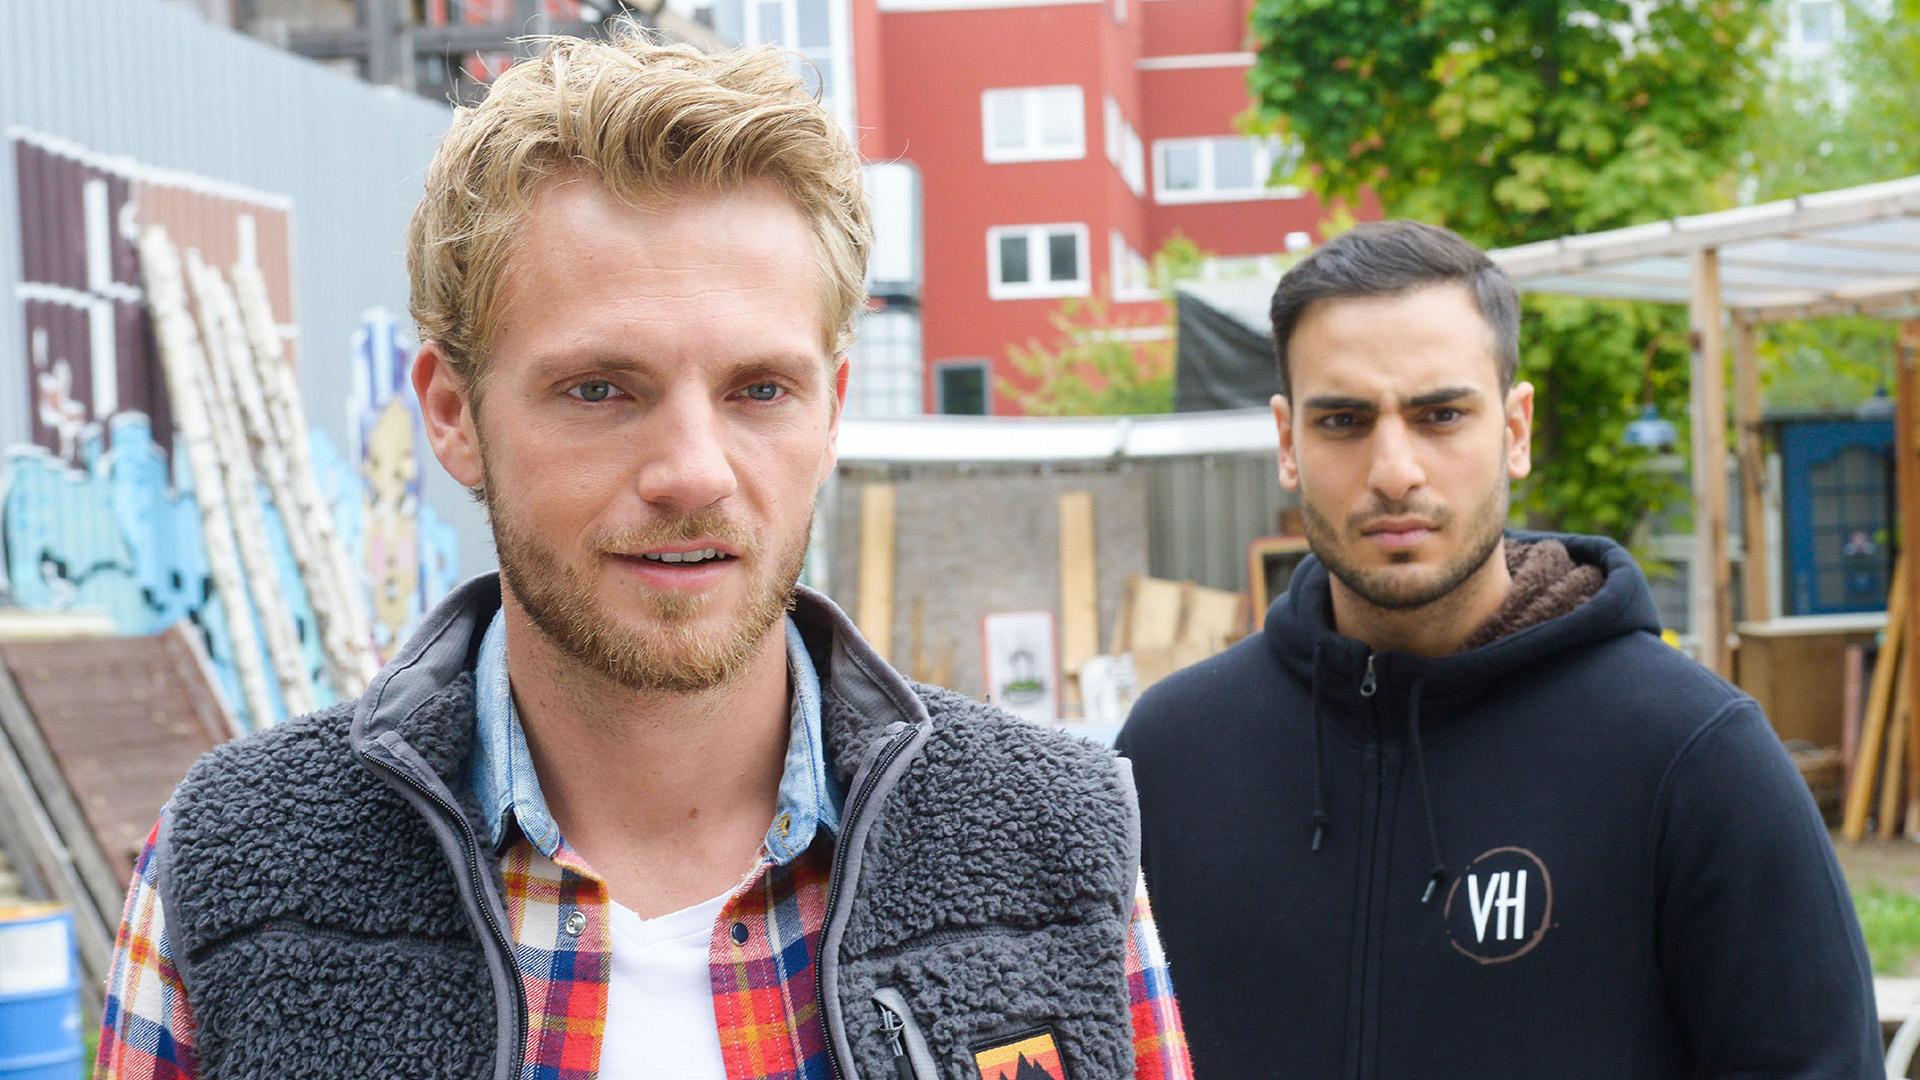 Paul und Nihat wundern sich über Tuners Imagewechsel | Folge 7046